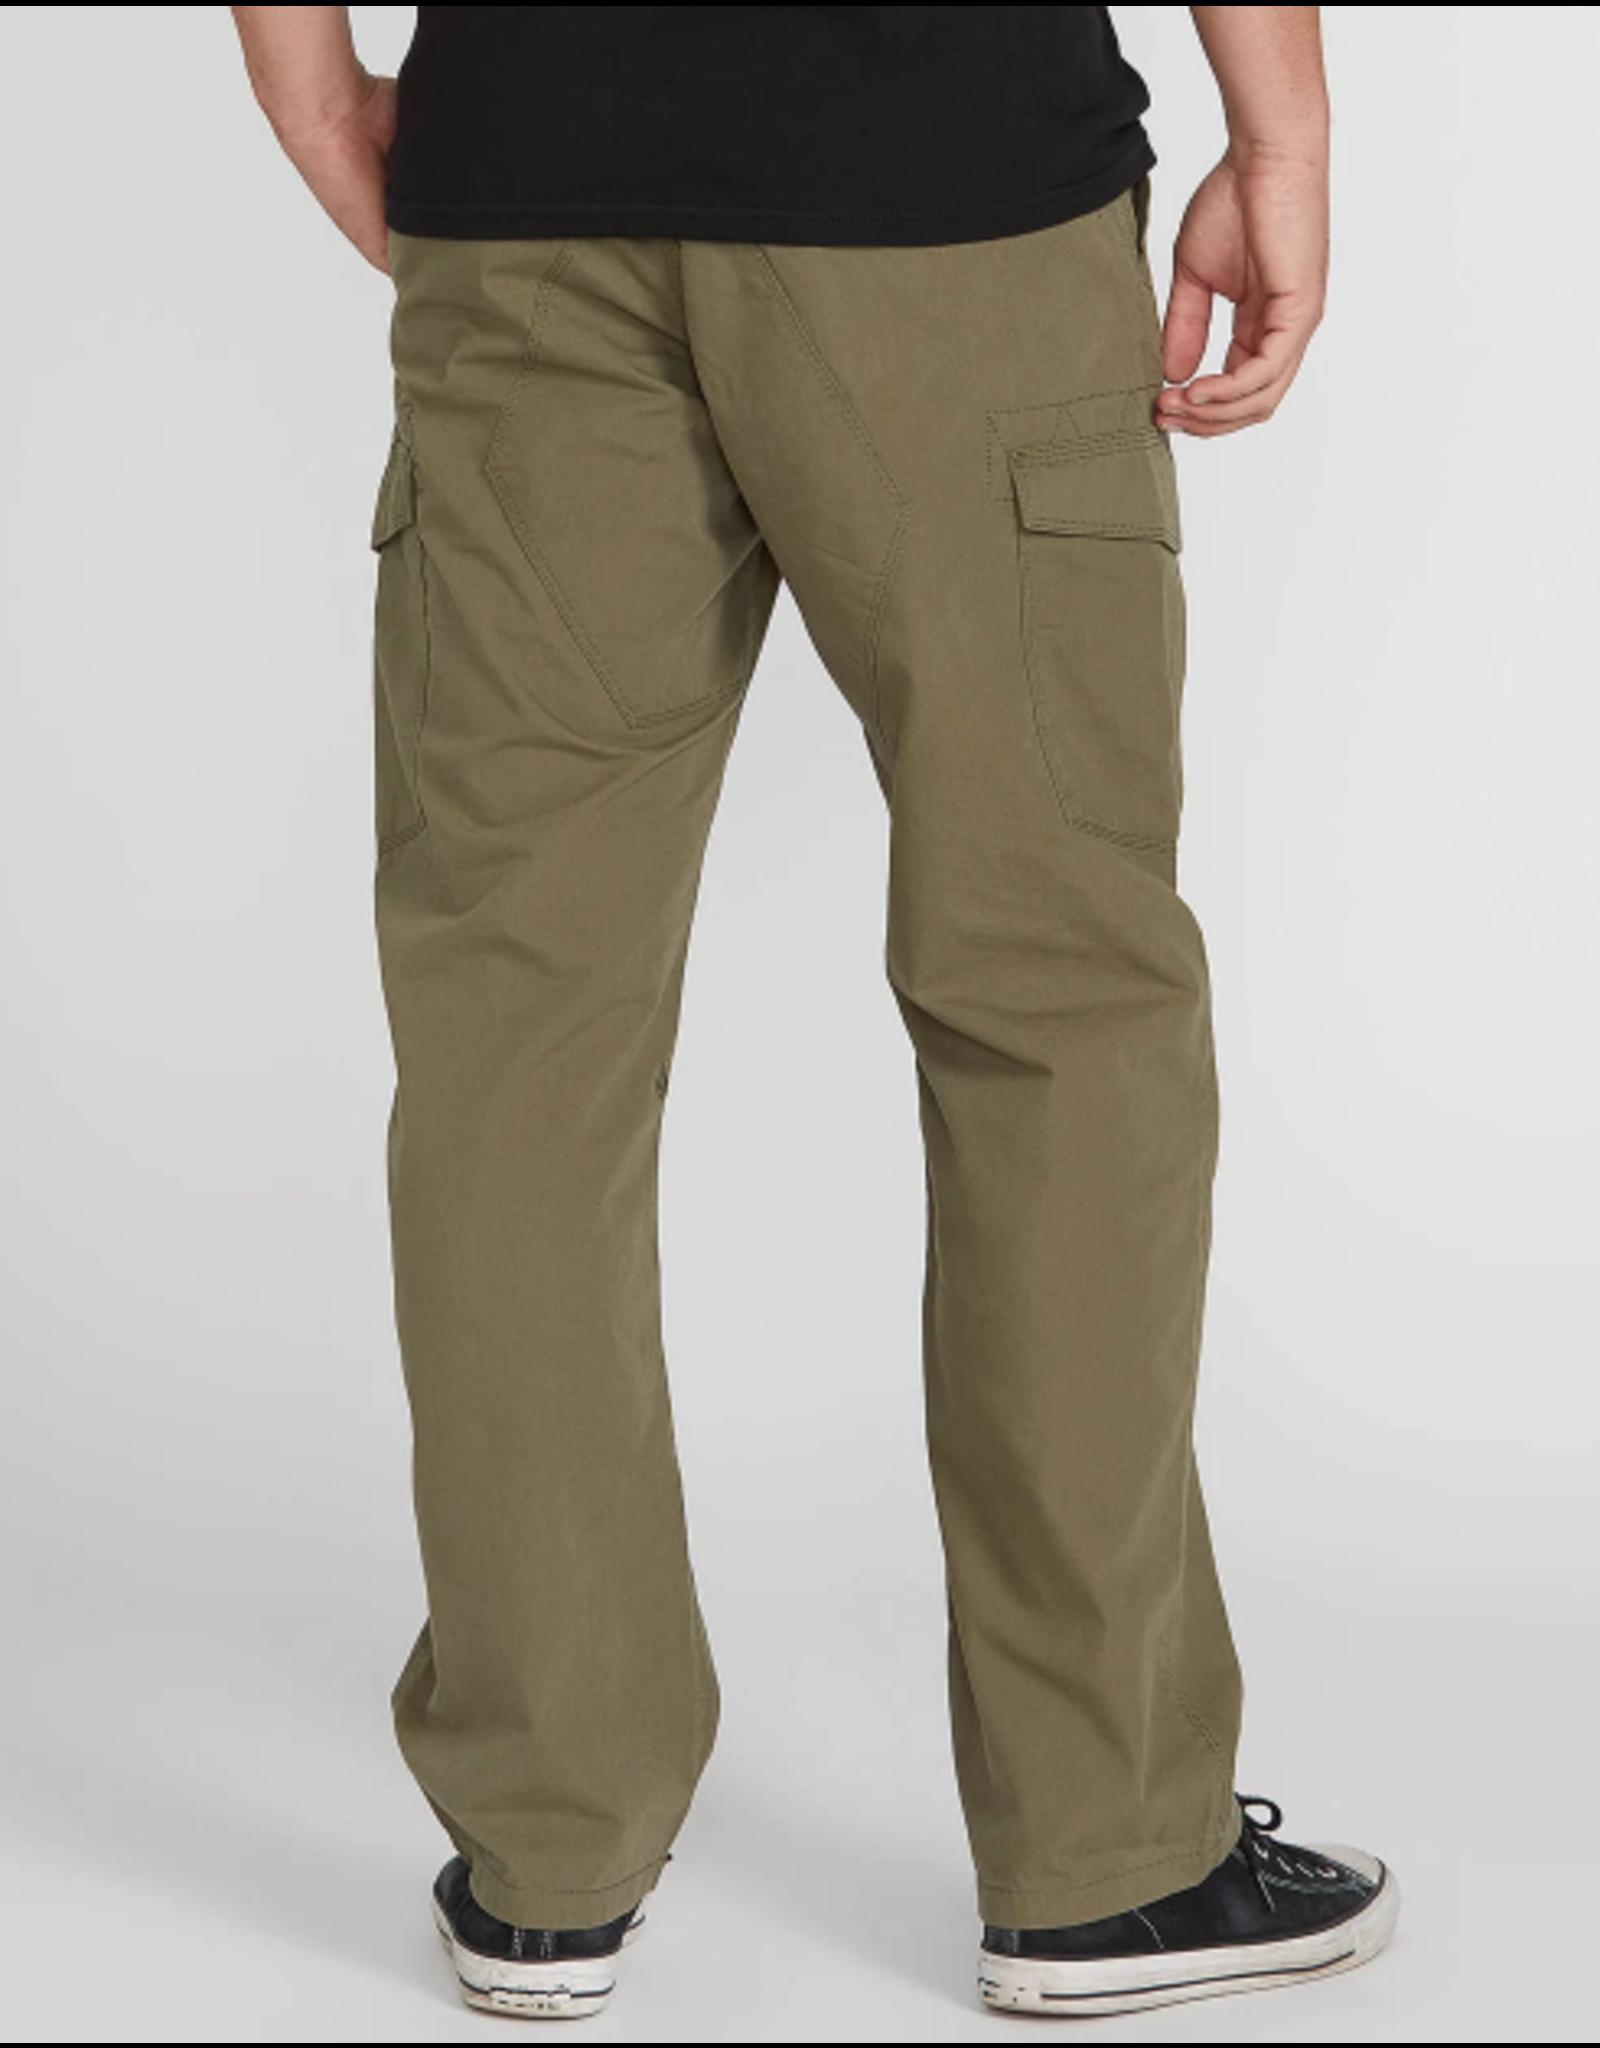 Volcom Miter II Cargo Pants - Army Green Combo